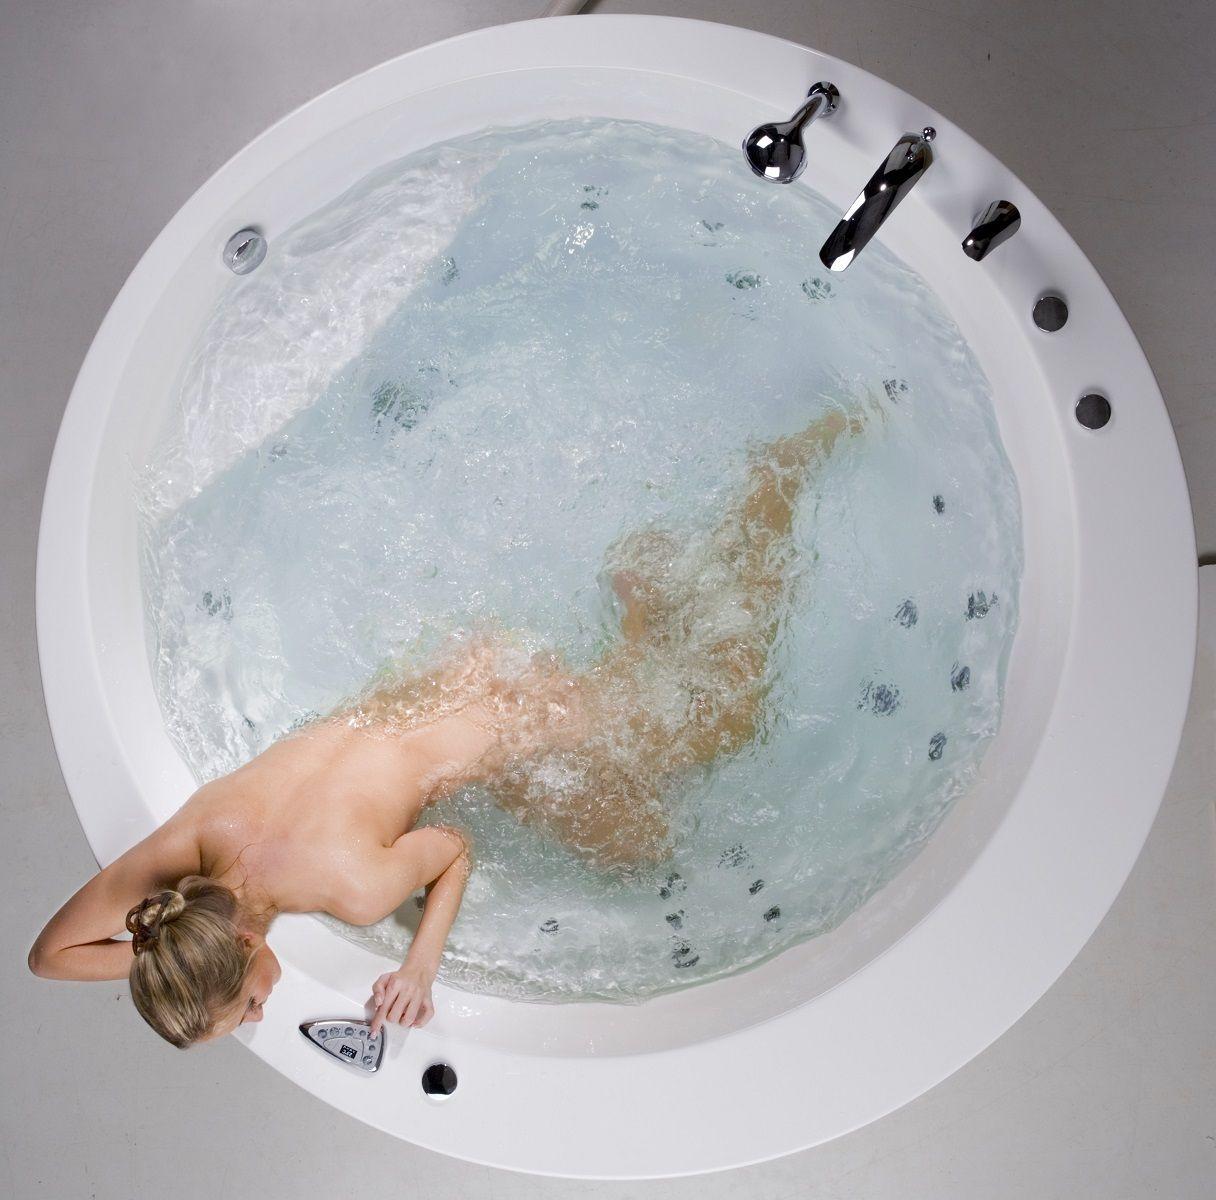 Aquatica Pamela-Wht Relax Air Massage Bathtub   Luxury jetted ...